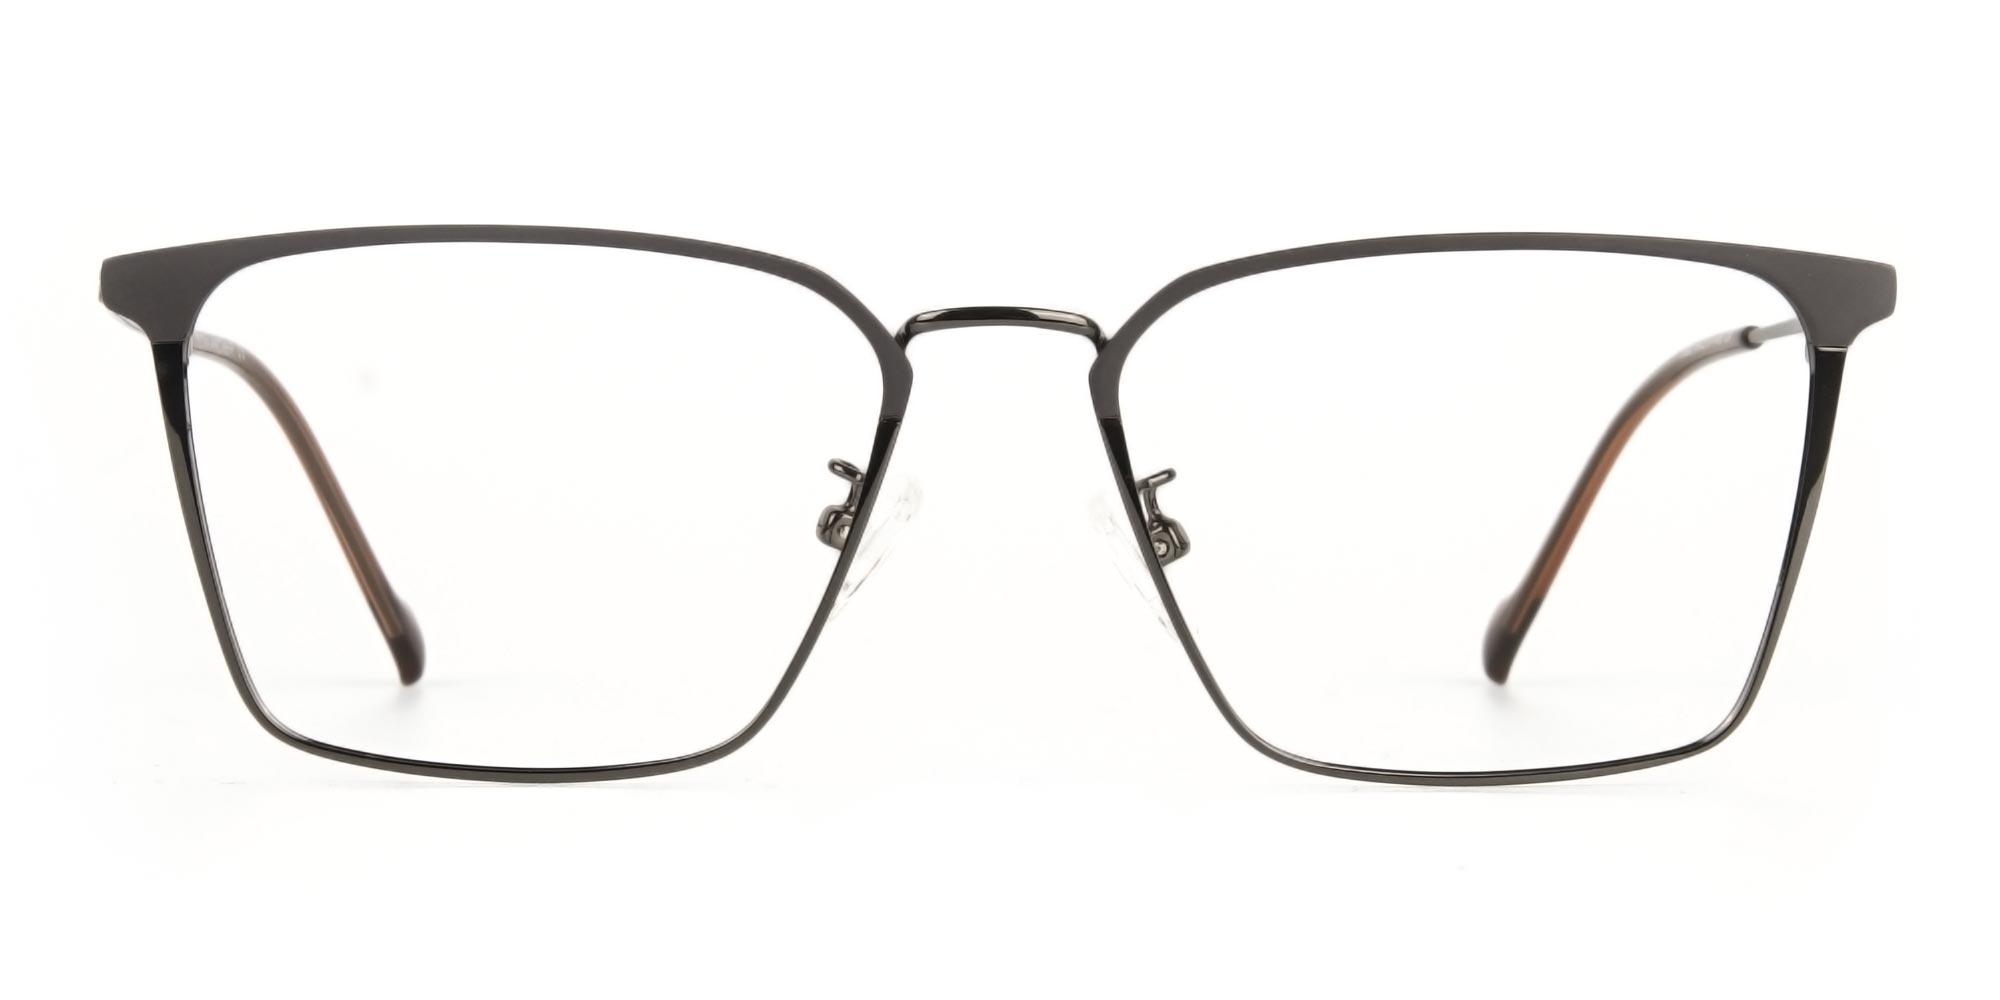 Lightweight Glasses in Subtle Gunmetal Wayfarer